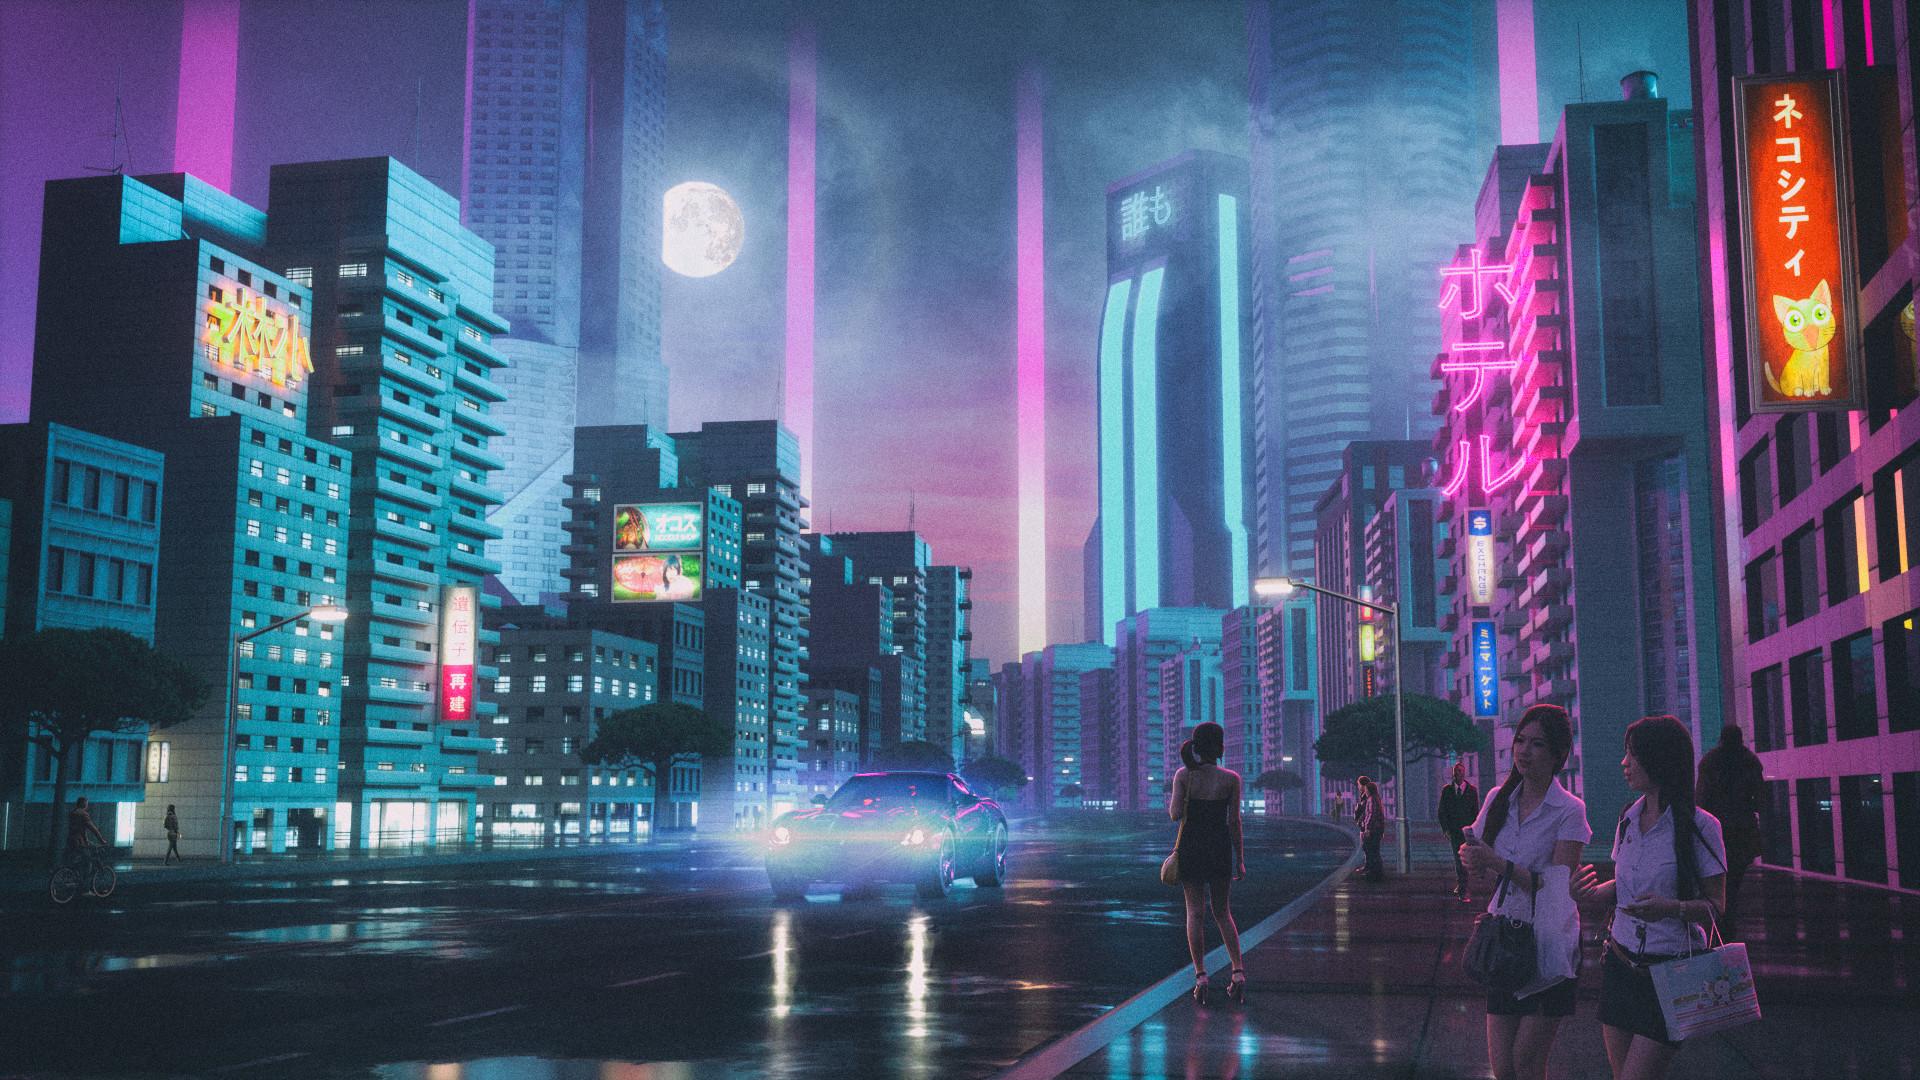 Wallpaper David Legnon Drawing Synthwave Retrowave Cyberpunk Neon Glow Purple Night Moon City People Car 1920x1080 Pitylaugh 1778135 Hd Wallpapers Wallhere